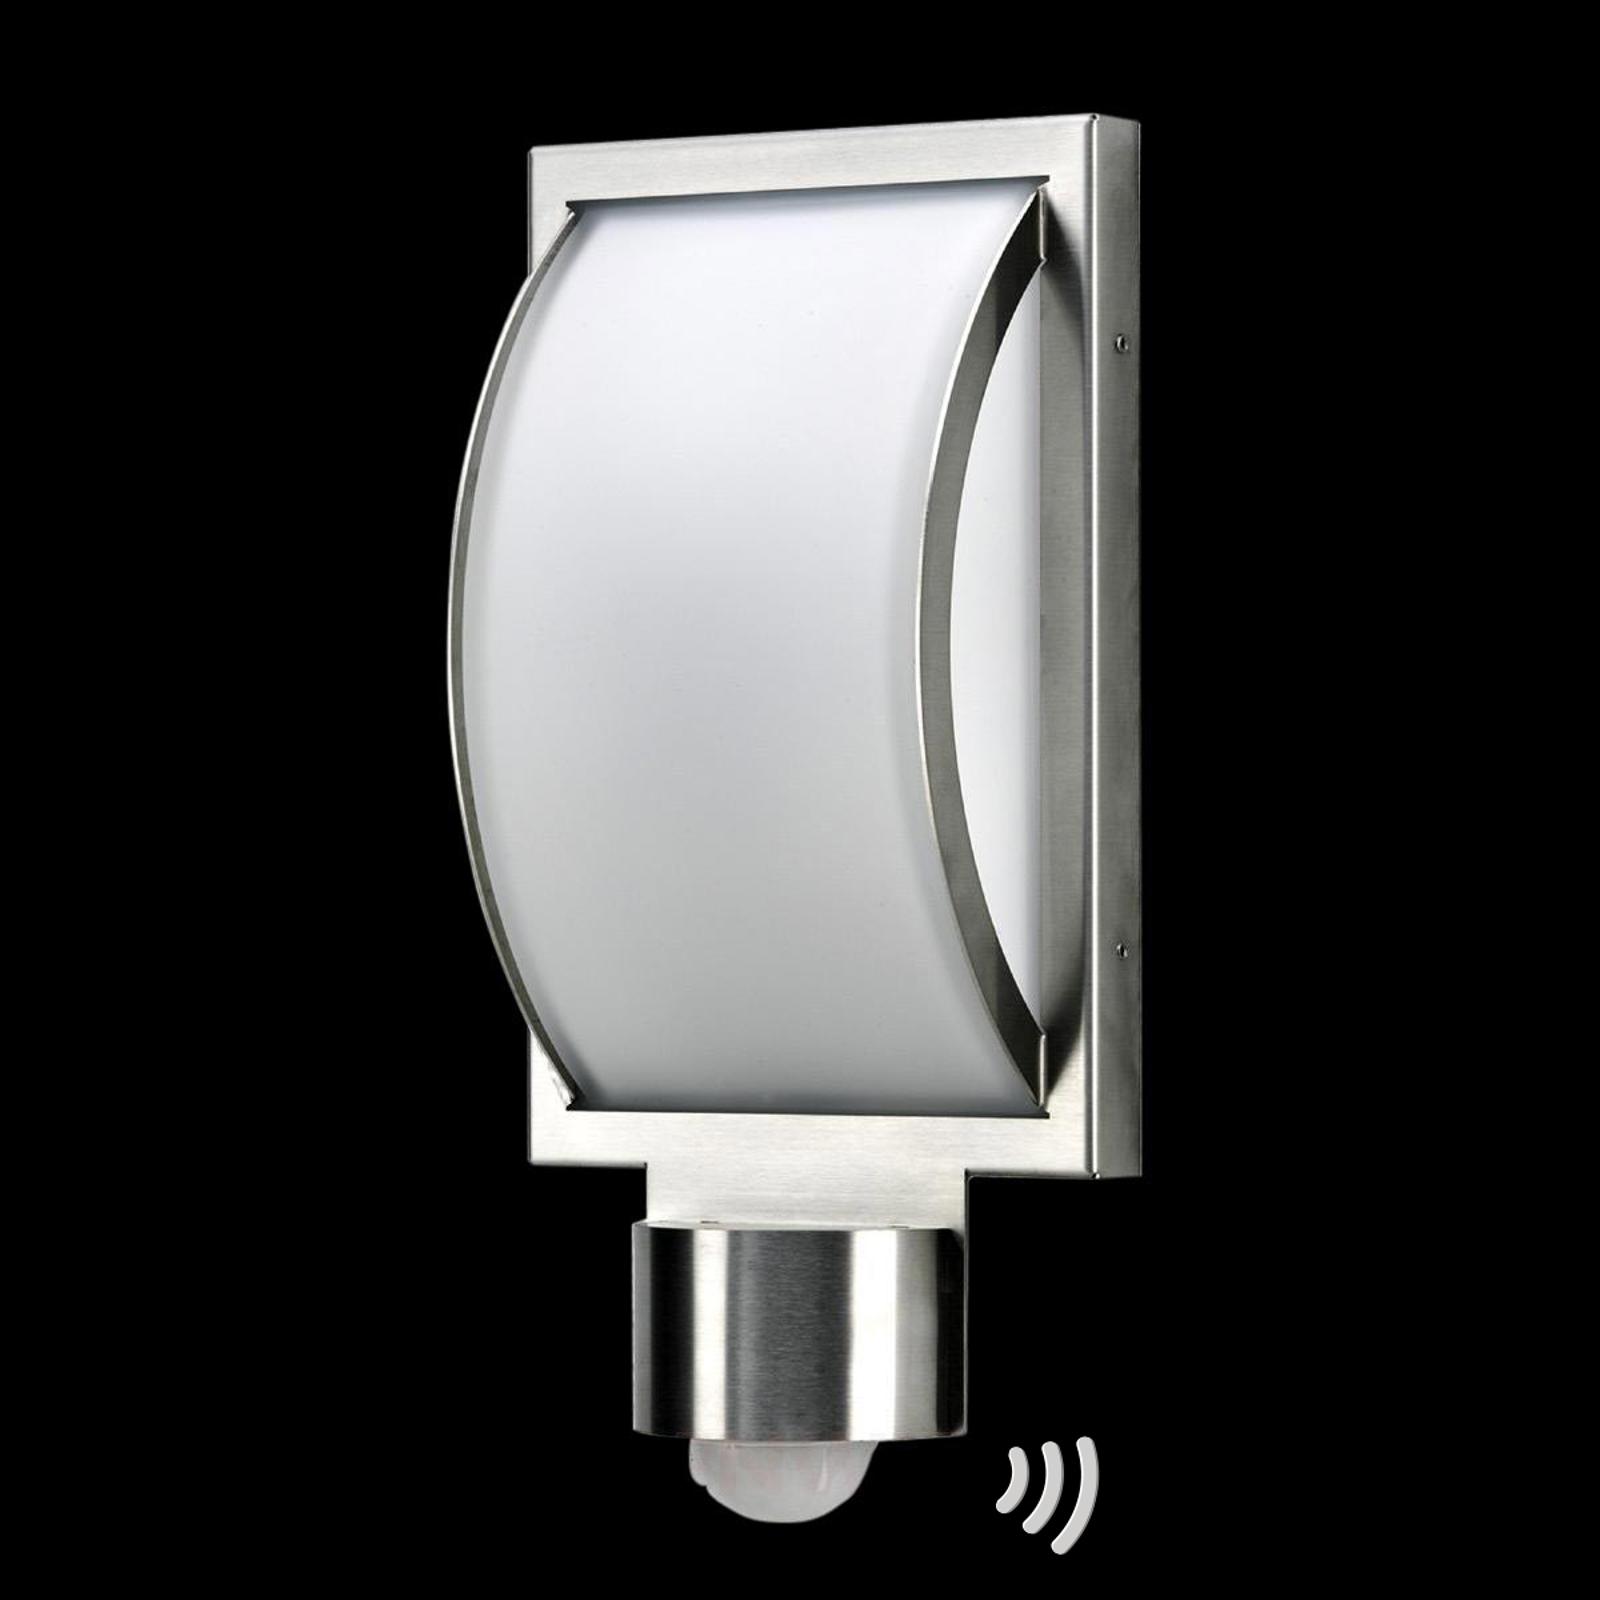 Buitenwandlamp Curvo met bewegingssensor